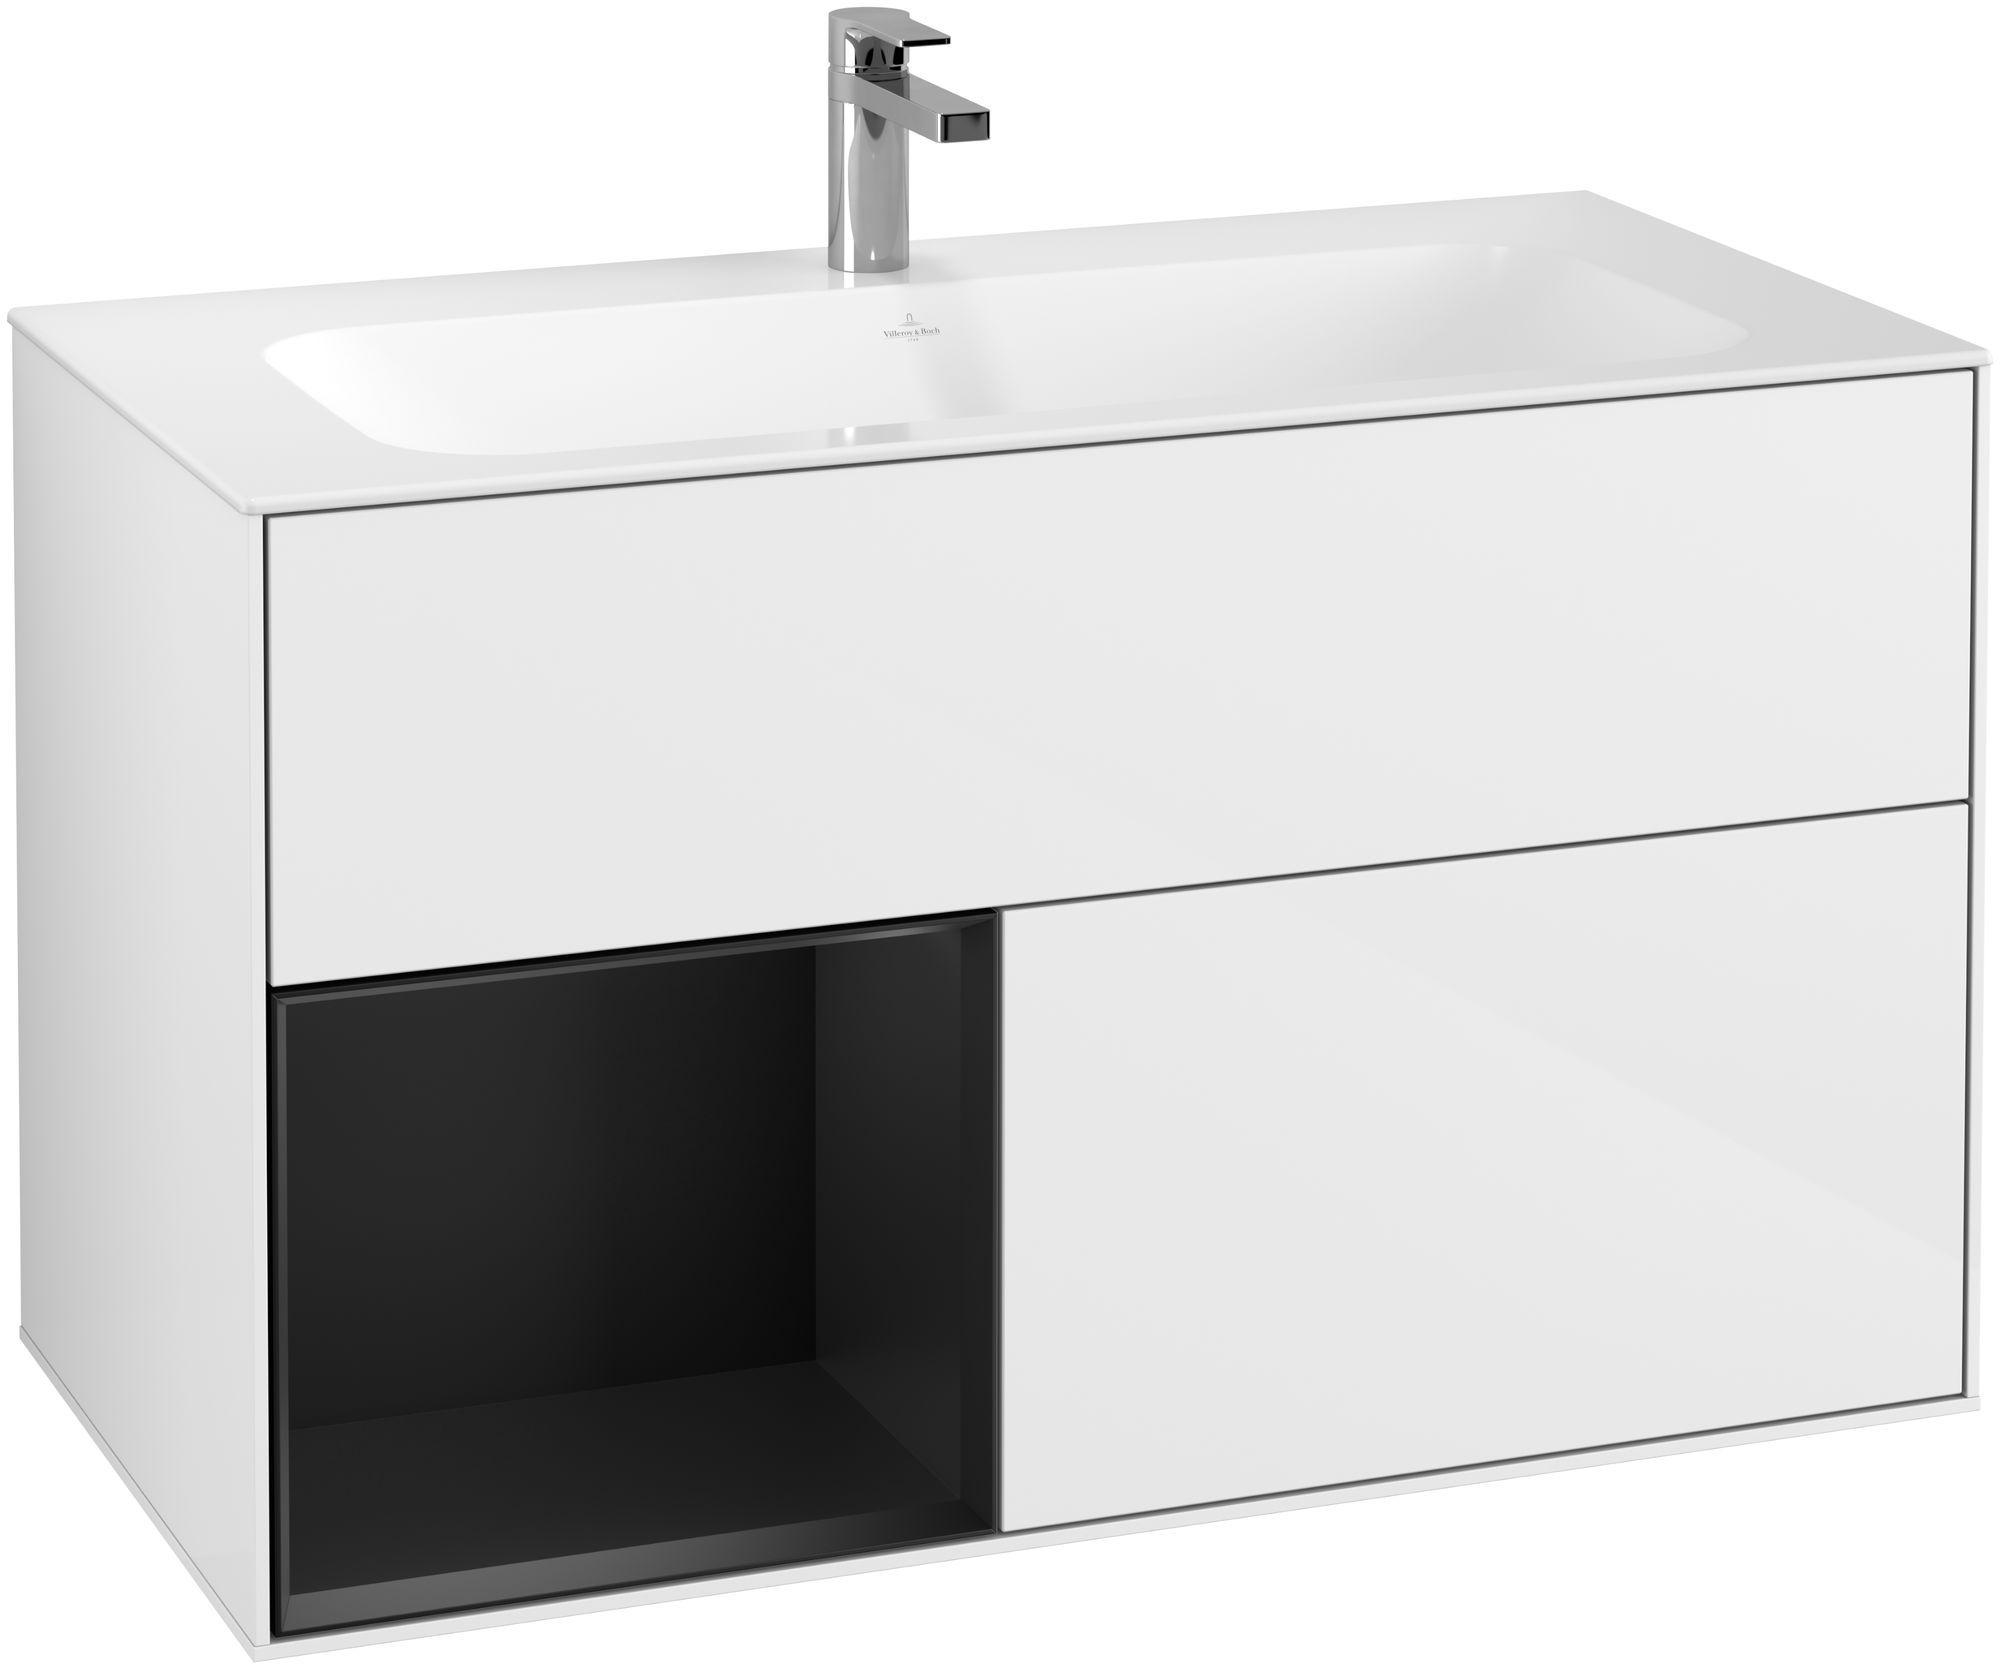 Villeroy & Boch Finion G03 Waschtischunterschrank mit Regalelement 2 Auszüge LED-Beleuchtung B:99,6xH:59,1xT:49,8cm Front, Korpus: Glossy White Lack, Regal: Black Matt Lacquer G030PDGF